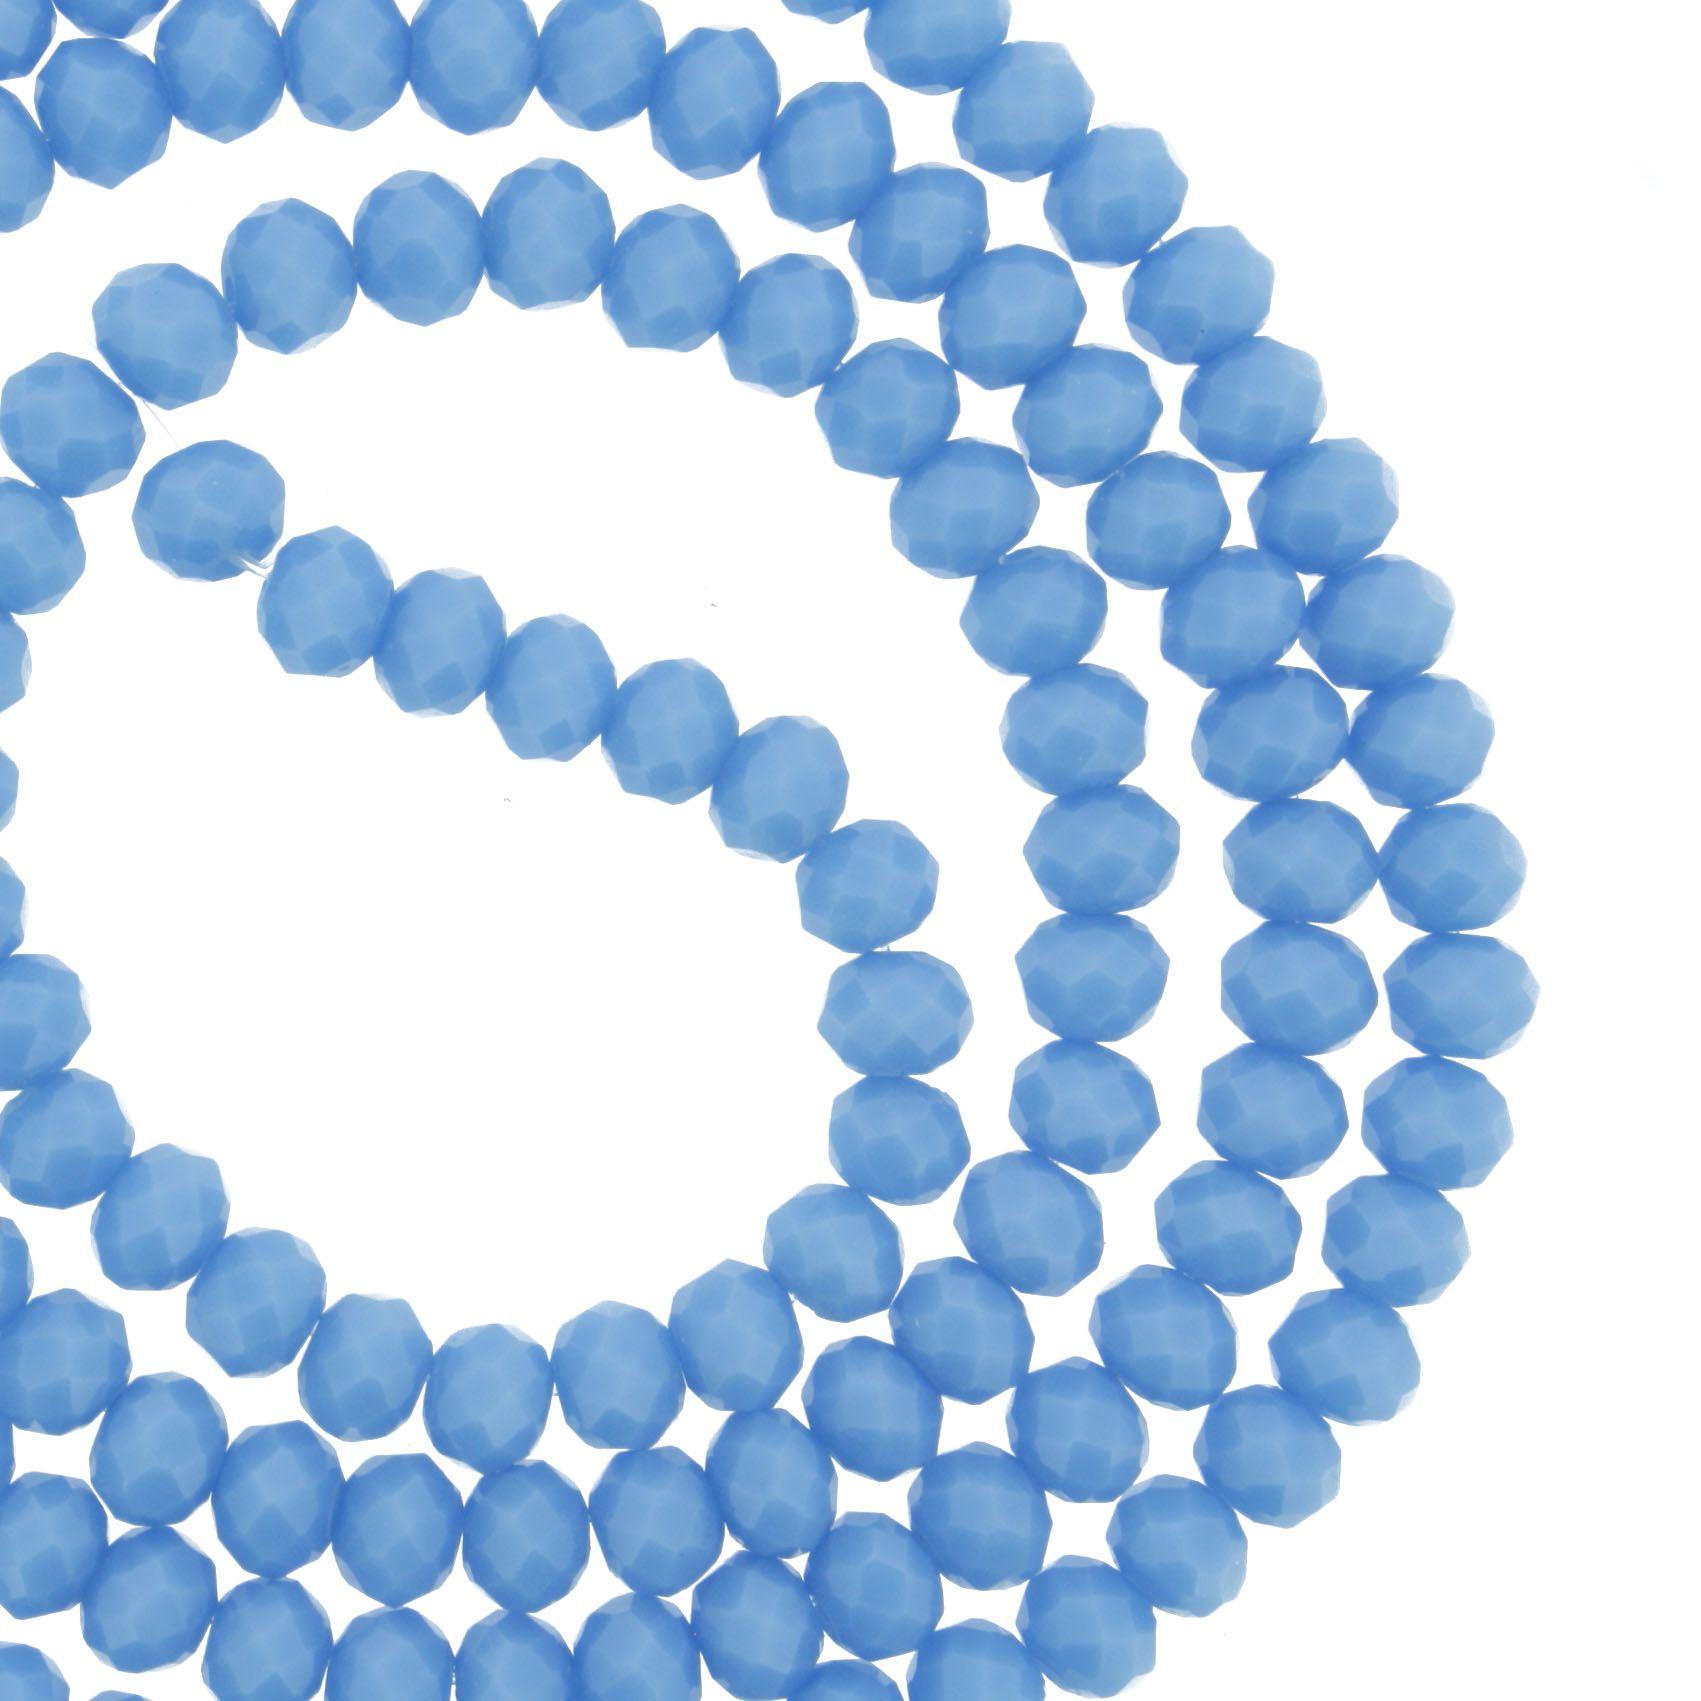 Fio de Cristal - Piatto® - Azul Claro - 4mm  - Universo Religioso® - Artigos de Umbanda e Candomblé